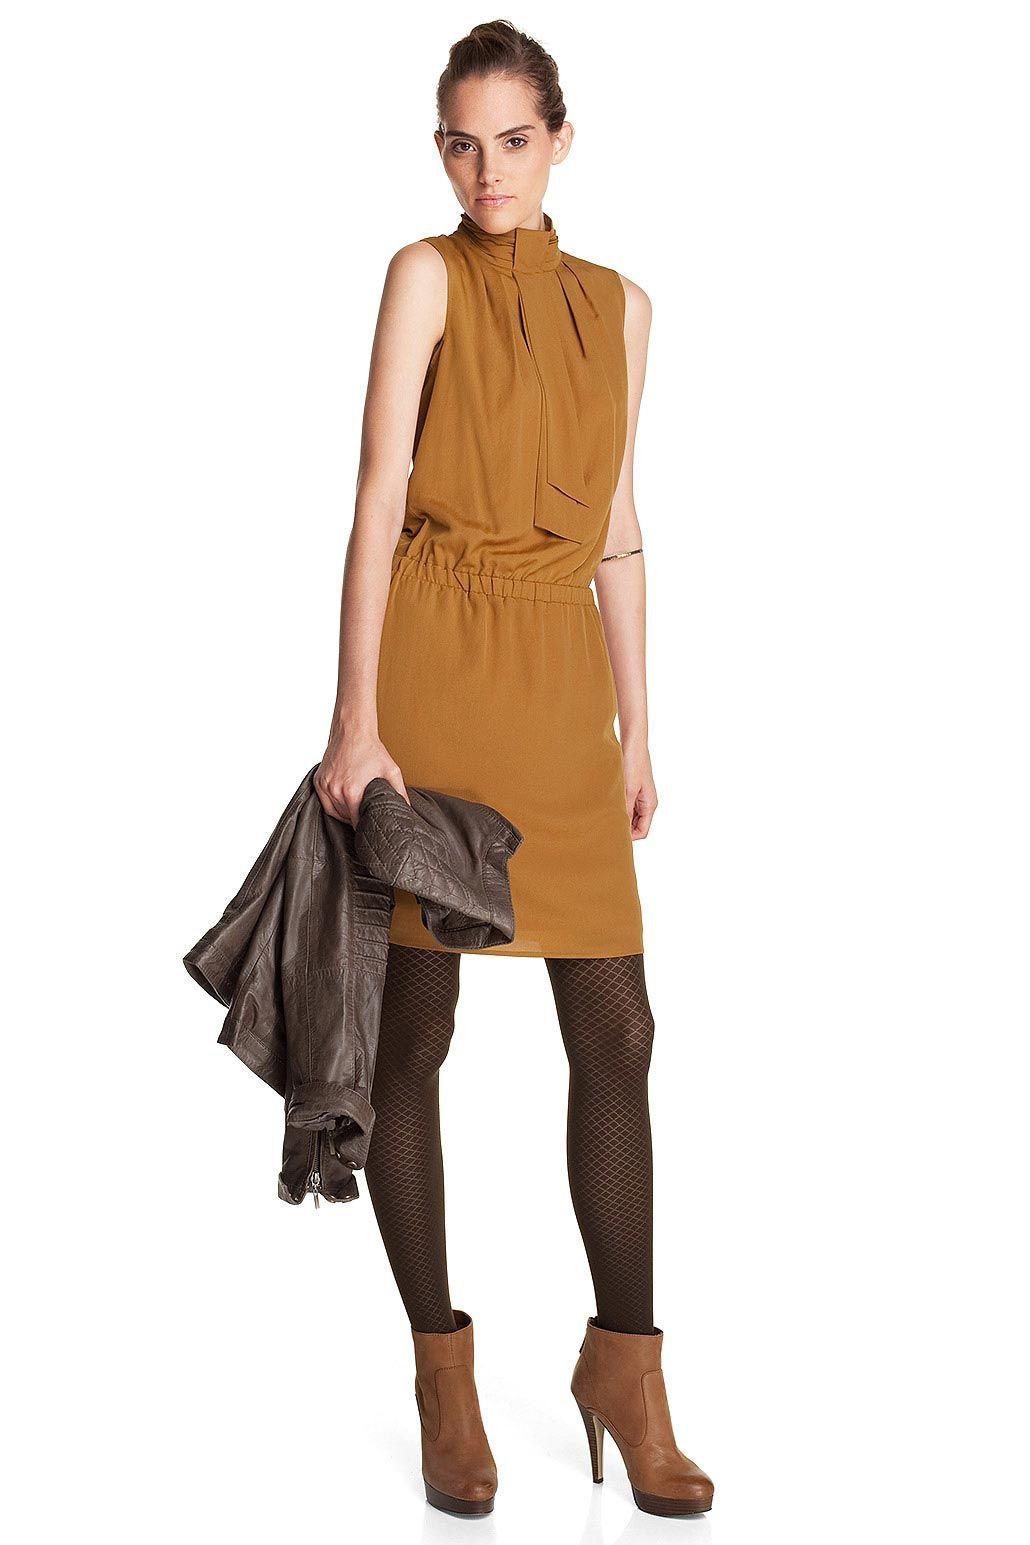 Mustard color crepe dress